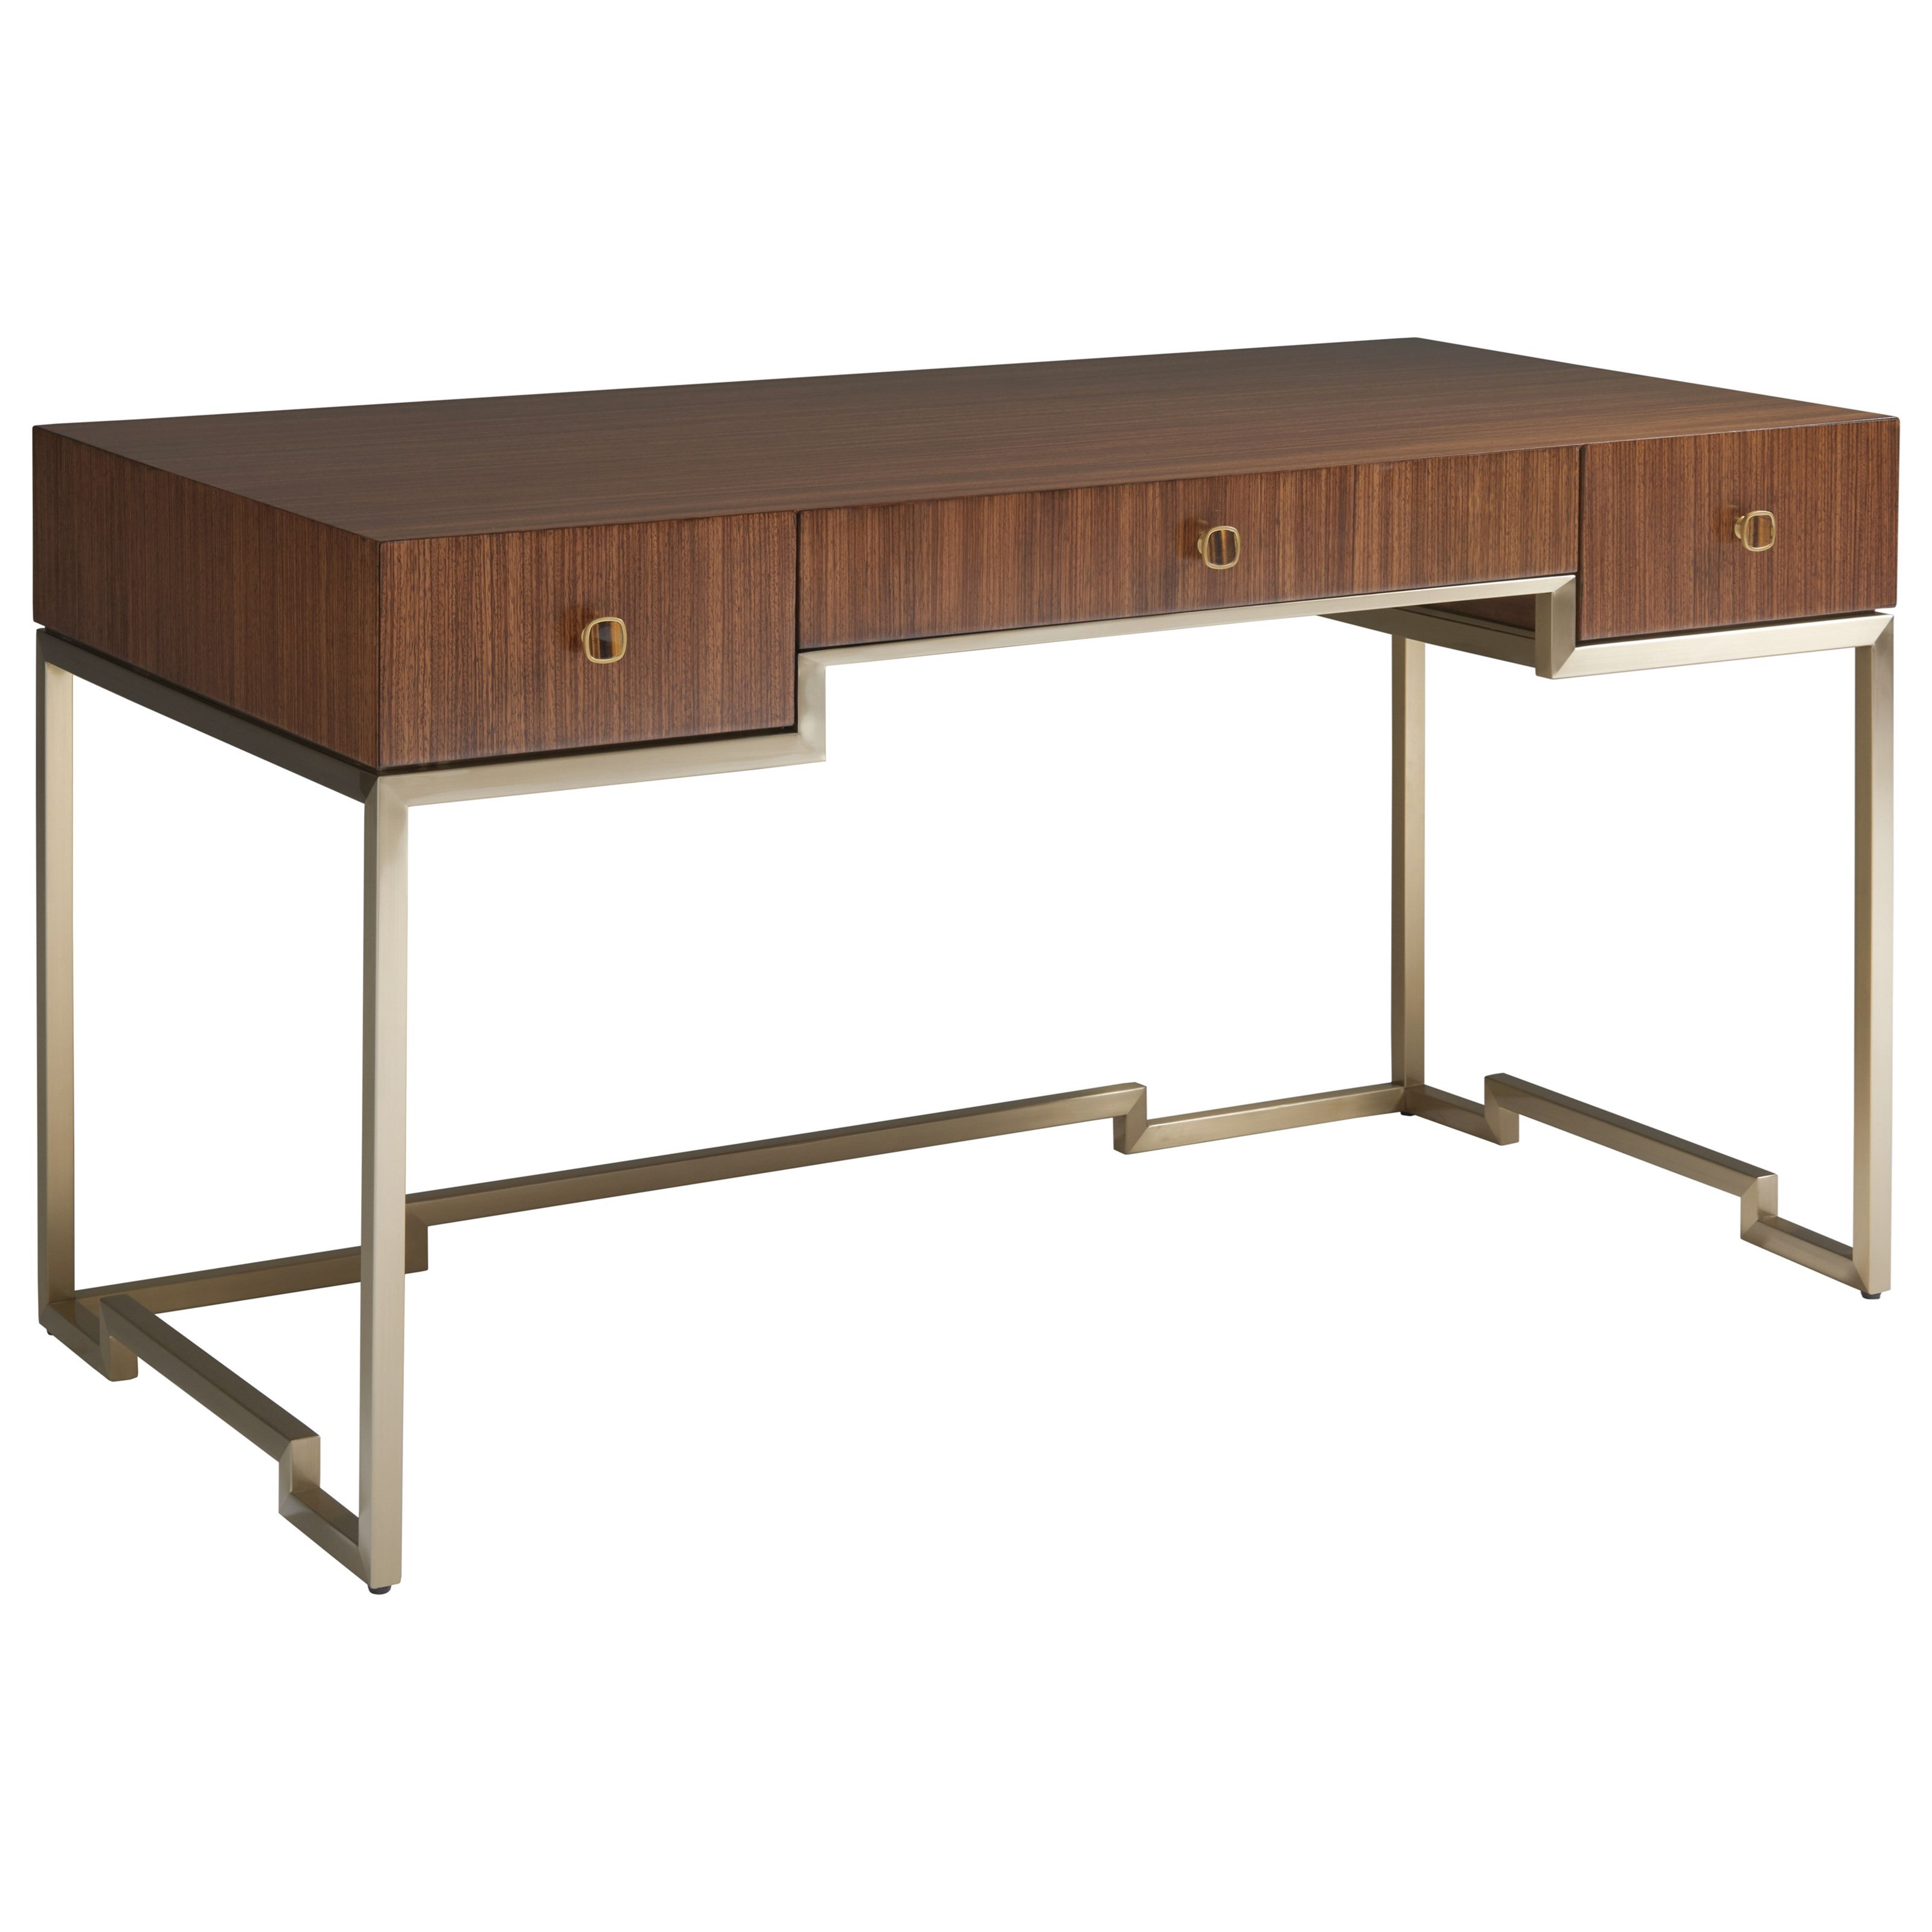 Aventura Writing Desk by Sligh at Baer's Furniture